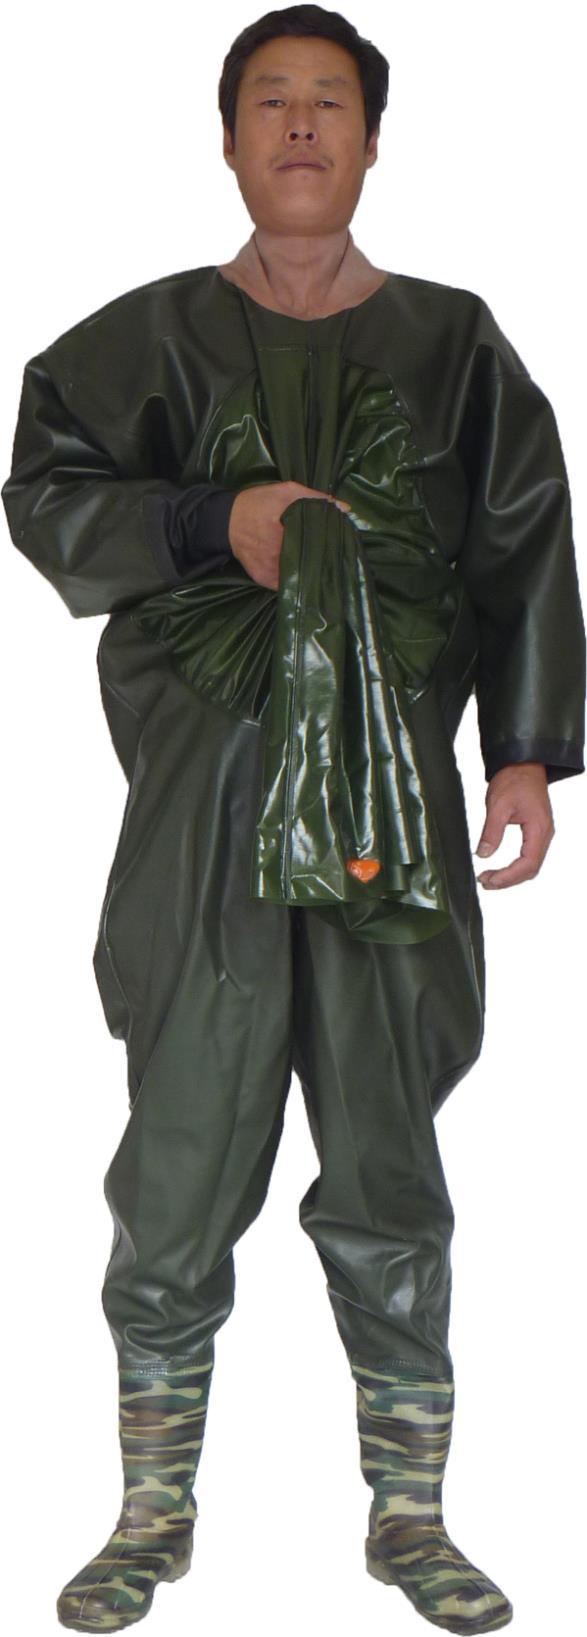 Одежда для рыбалки XL, xXL, xxXL, XXXXL бот для рыбалки archeage